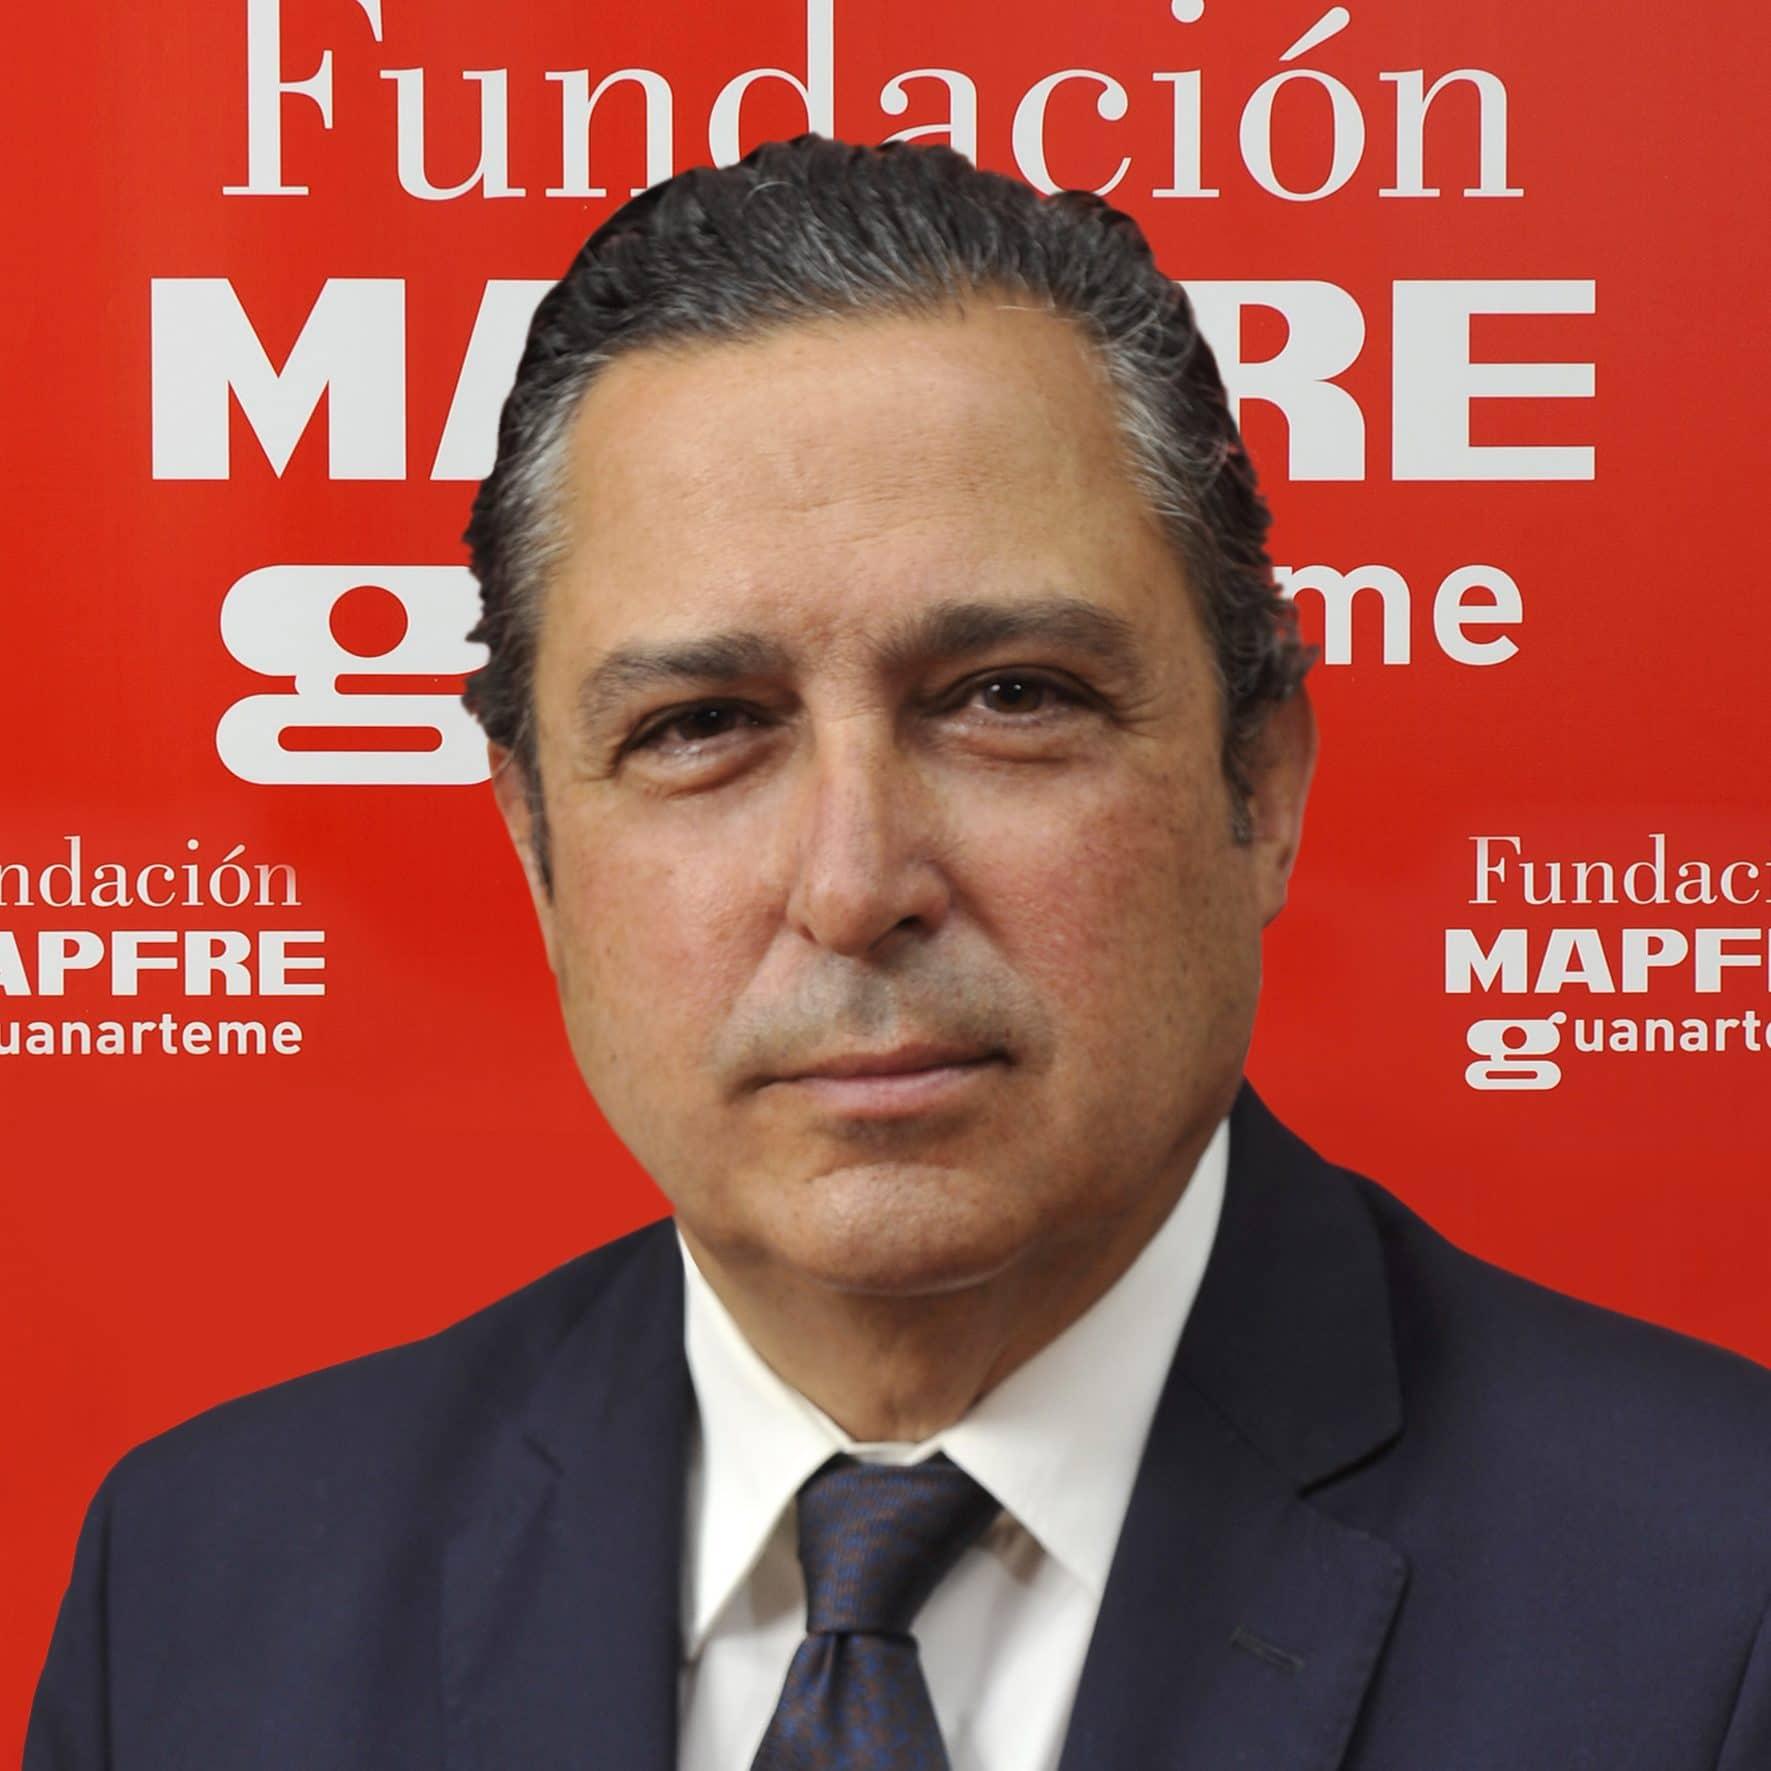 Miguel Herreros Altamirano